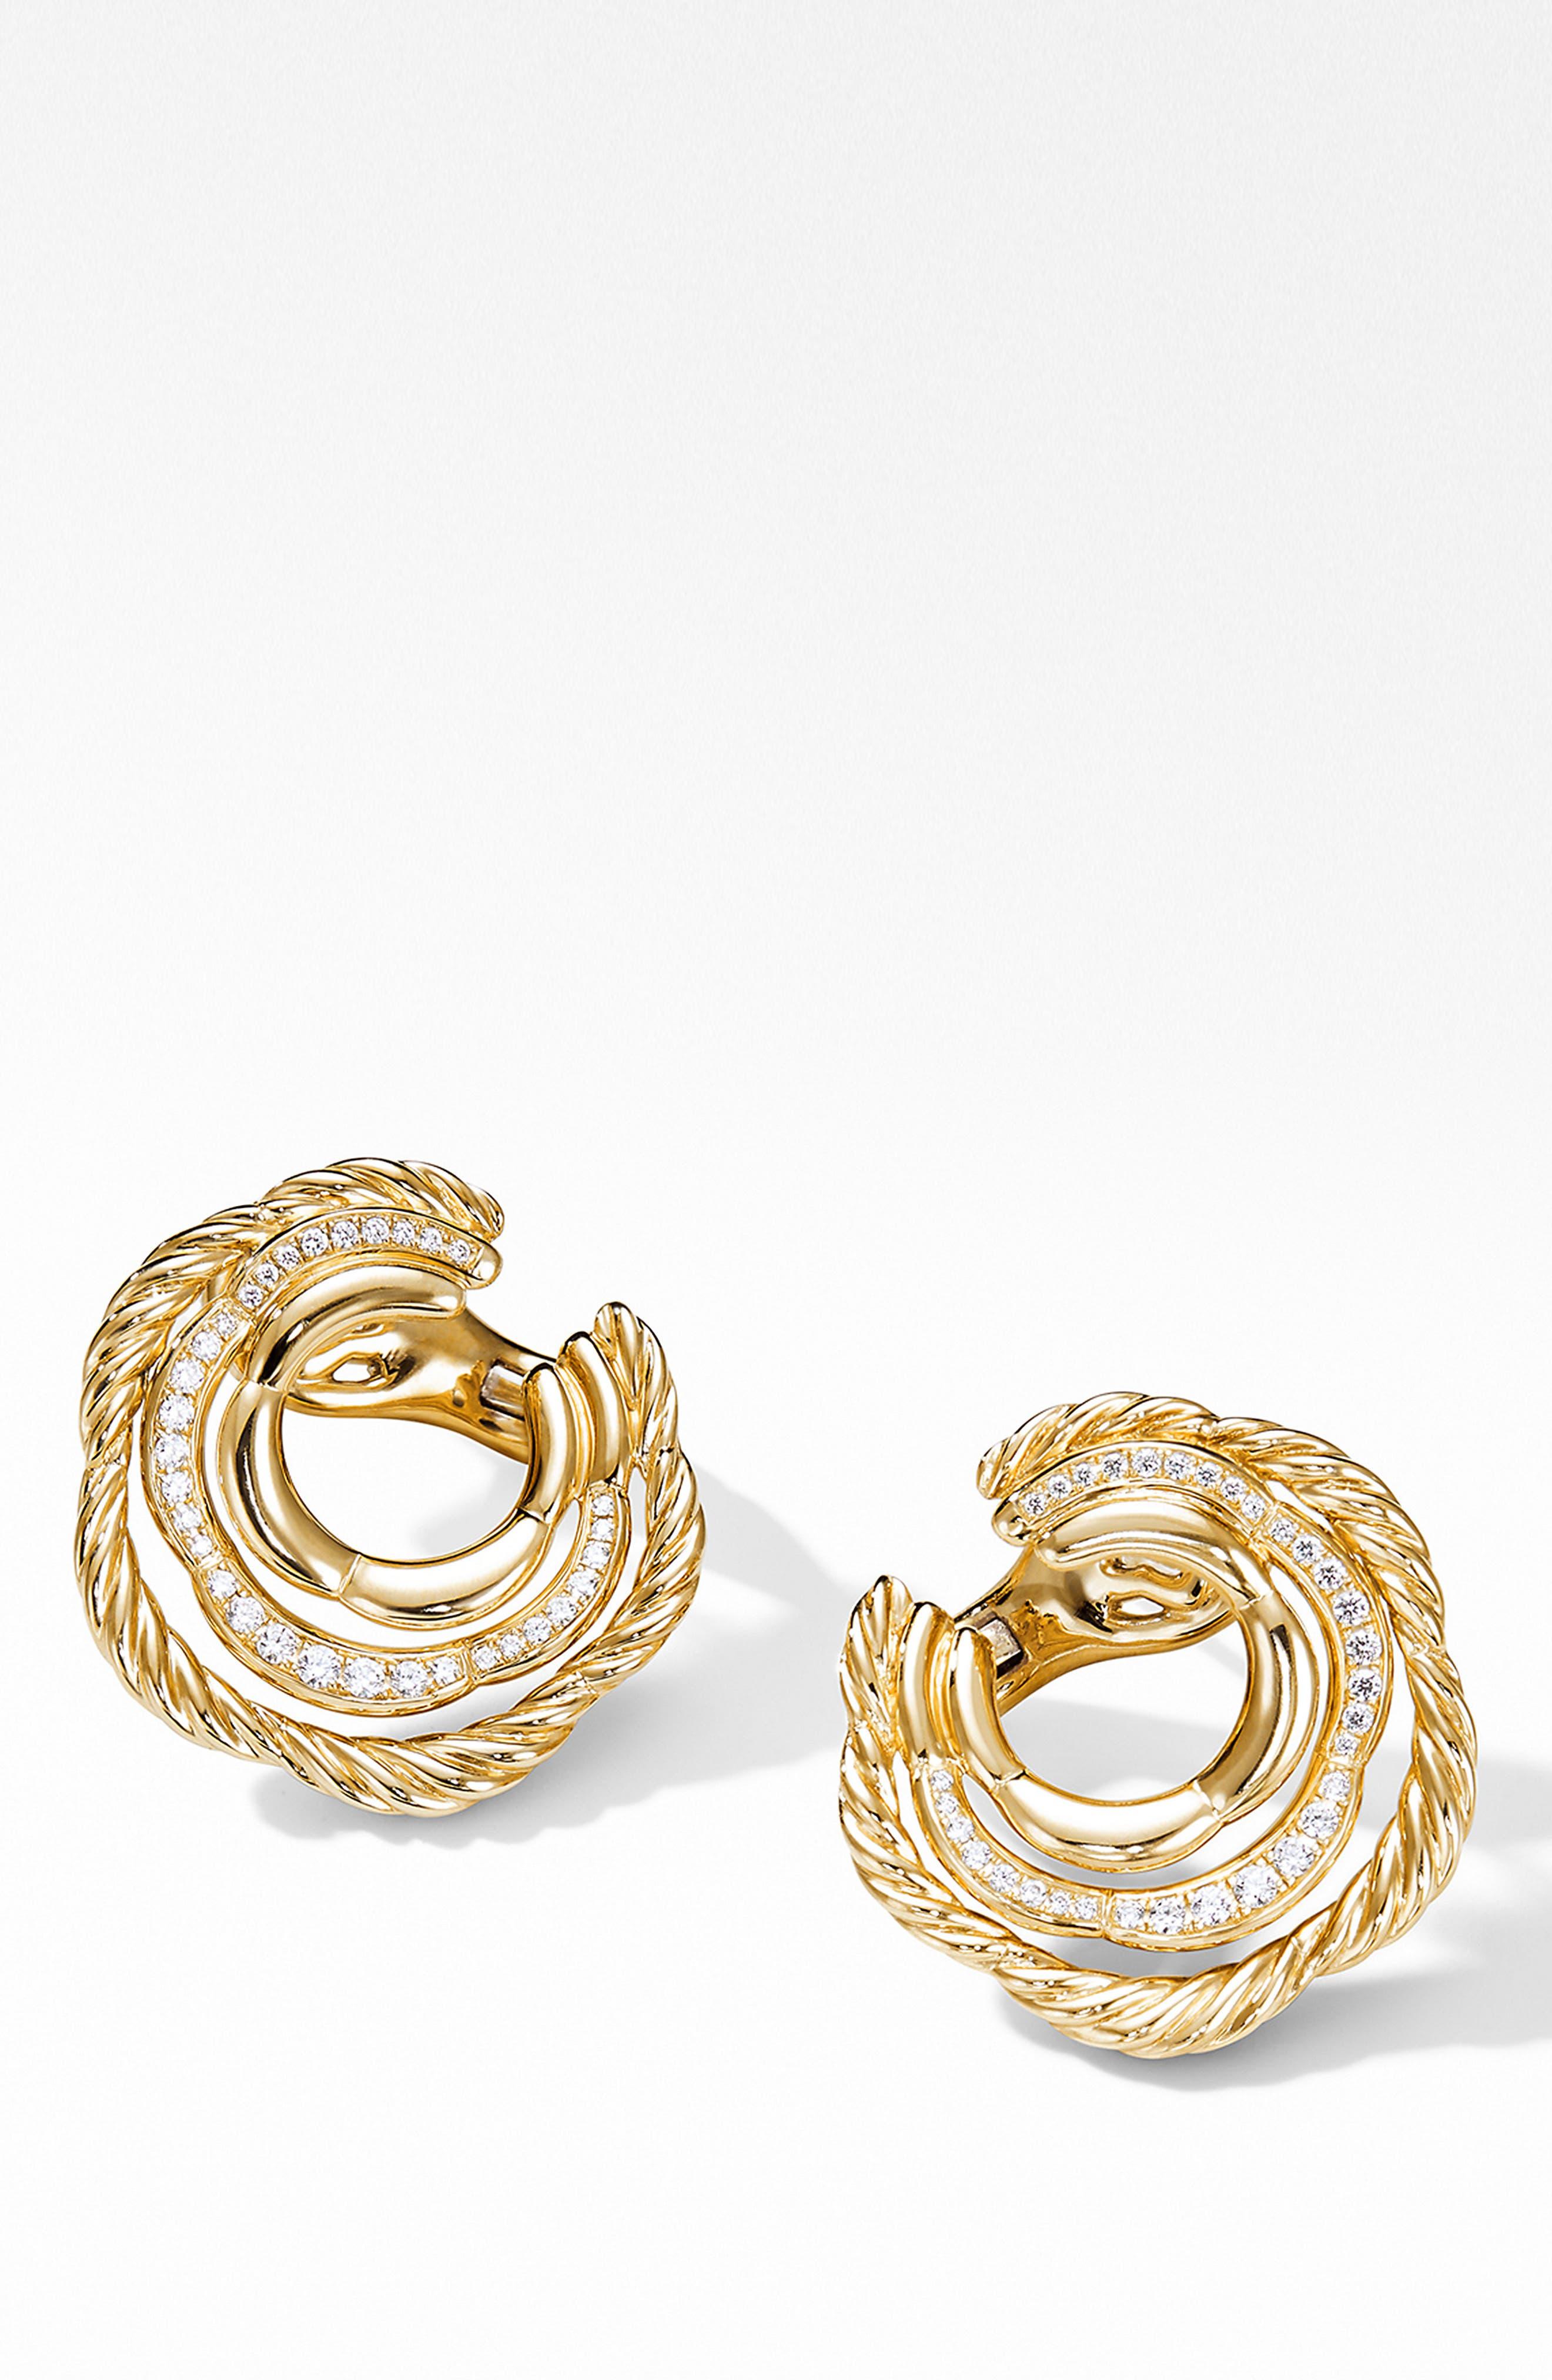 Tides Huggie Hoop Earrings with Pavé Diamonds,                             Alternate thumbnail 2, color,                             GOLD/ DIAMOND